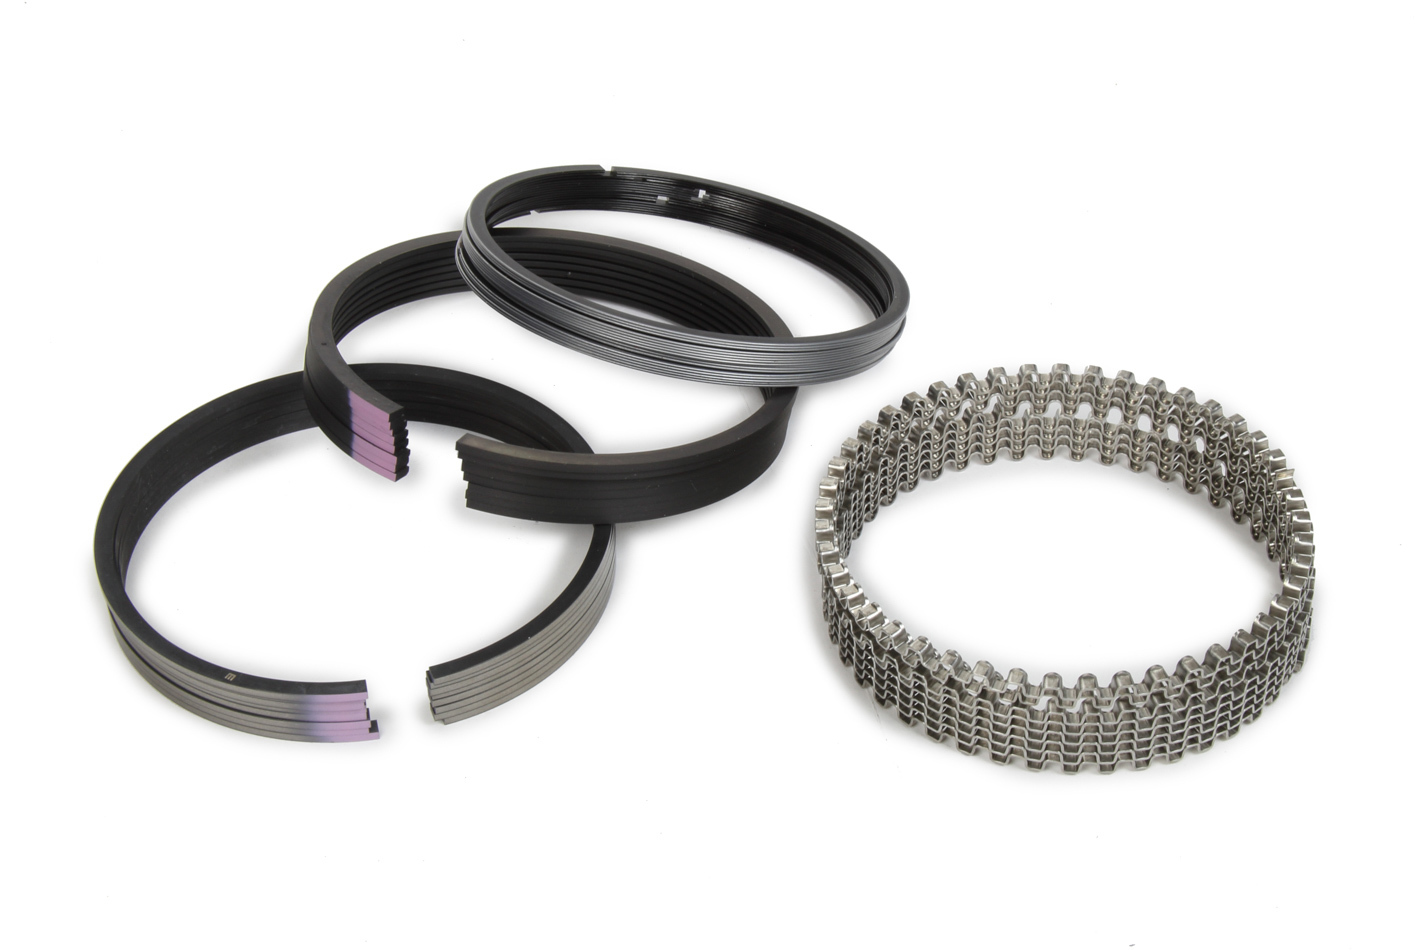 Piston Ring Set 4.040 Moly 5/64 5/64 3/16